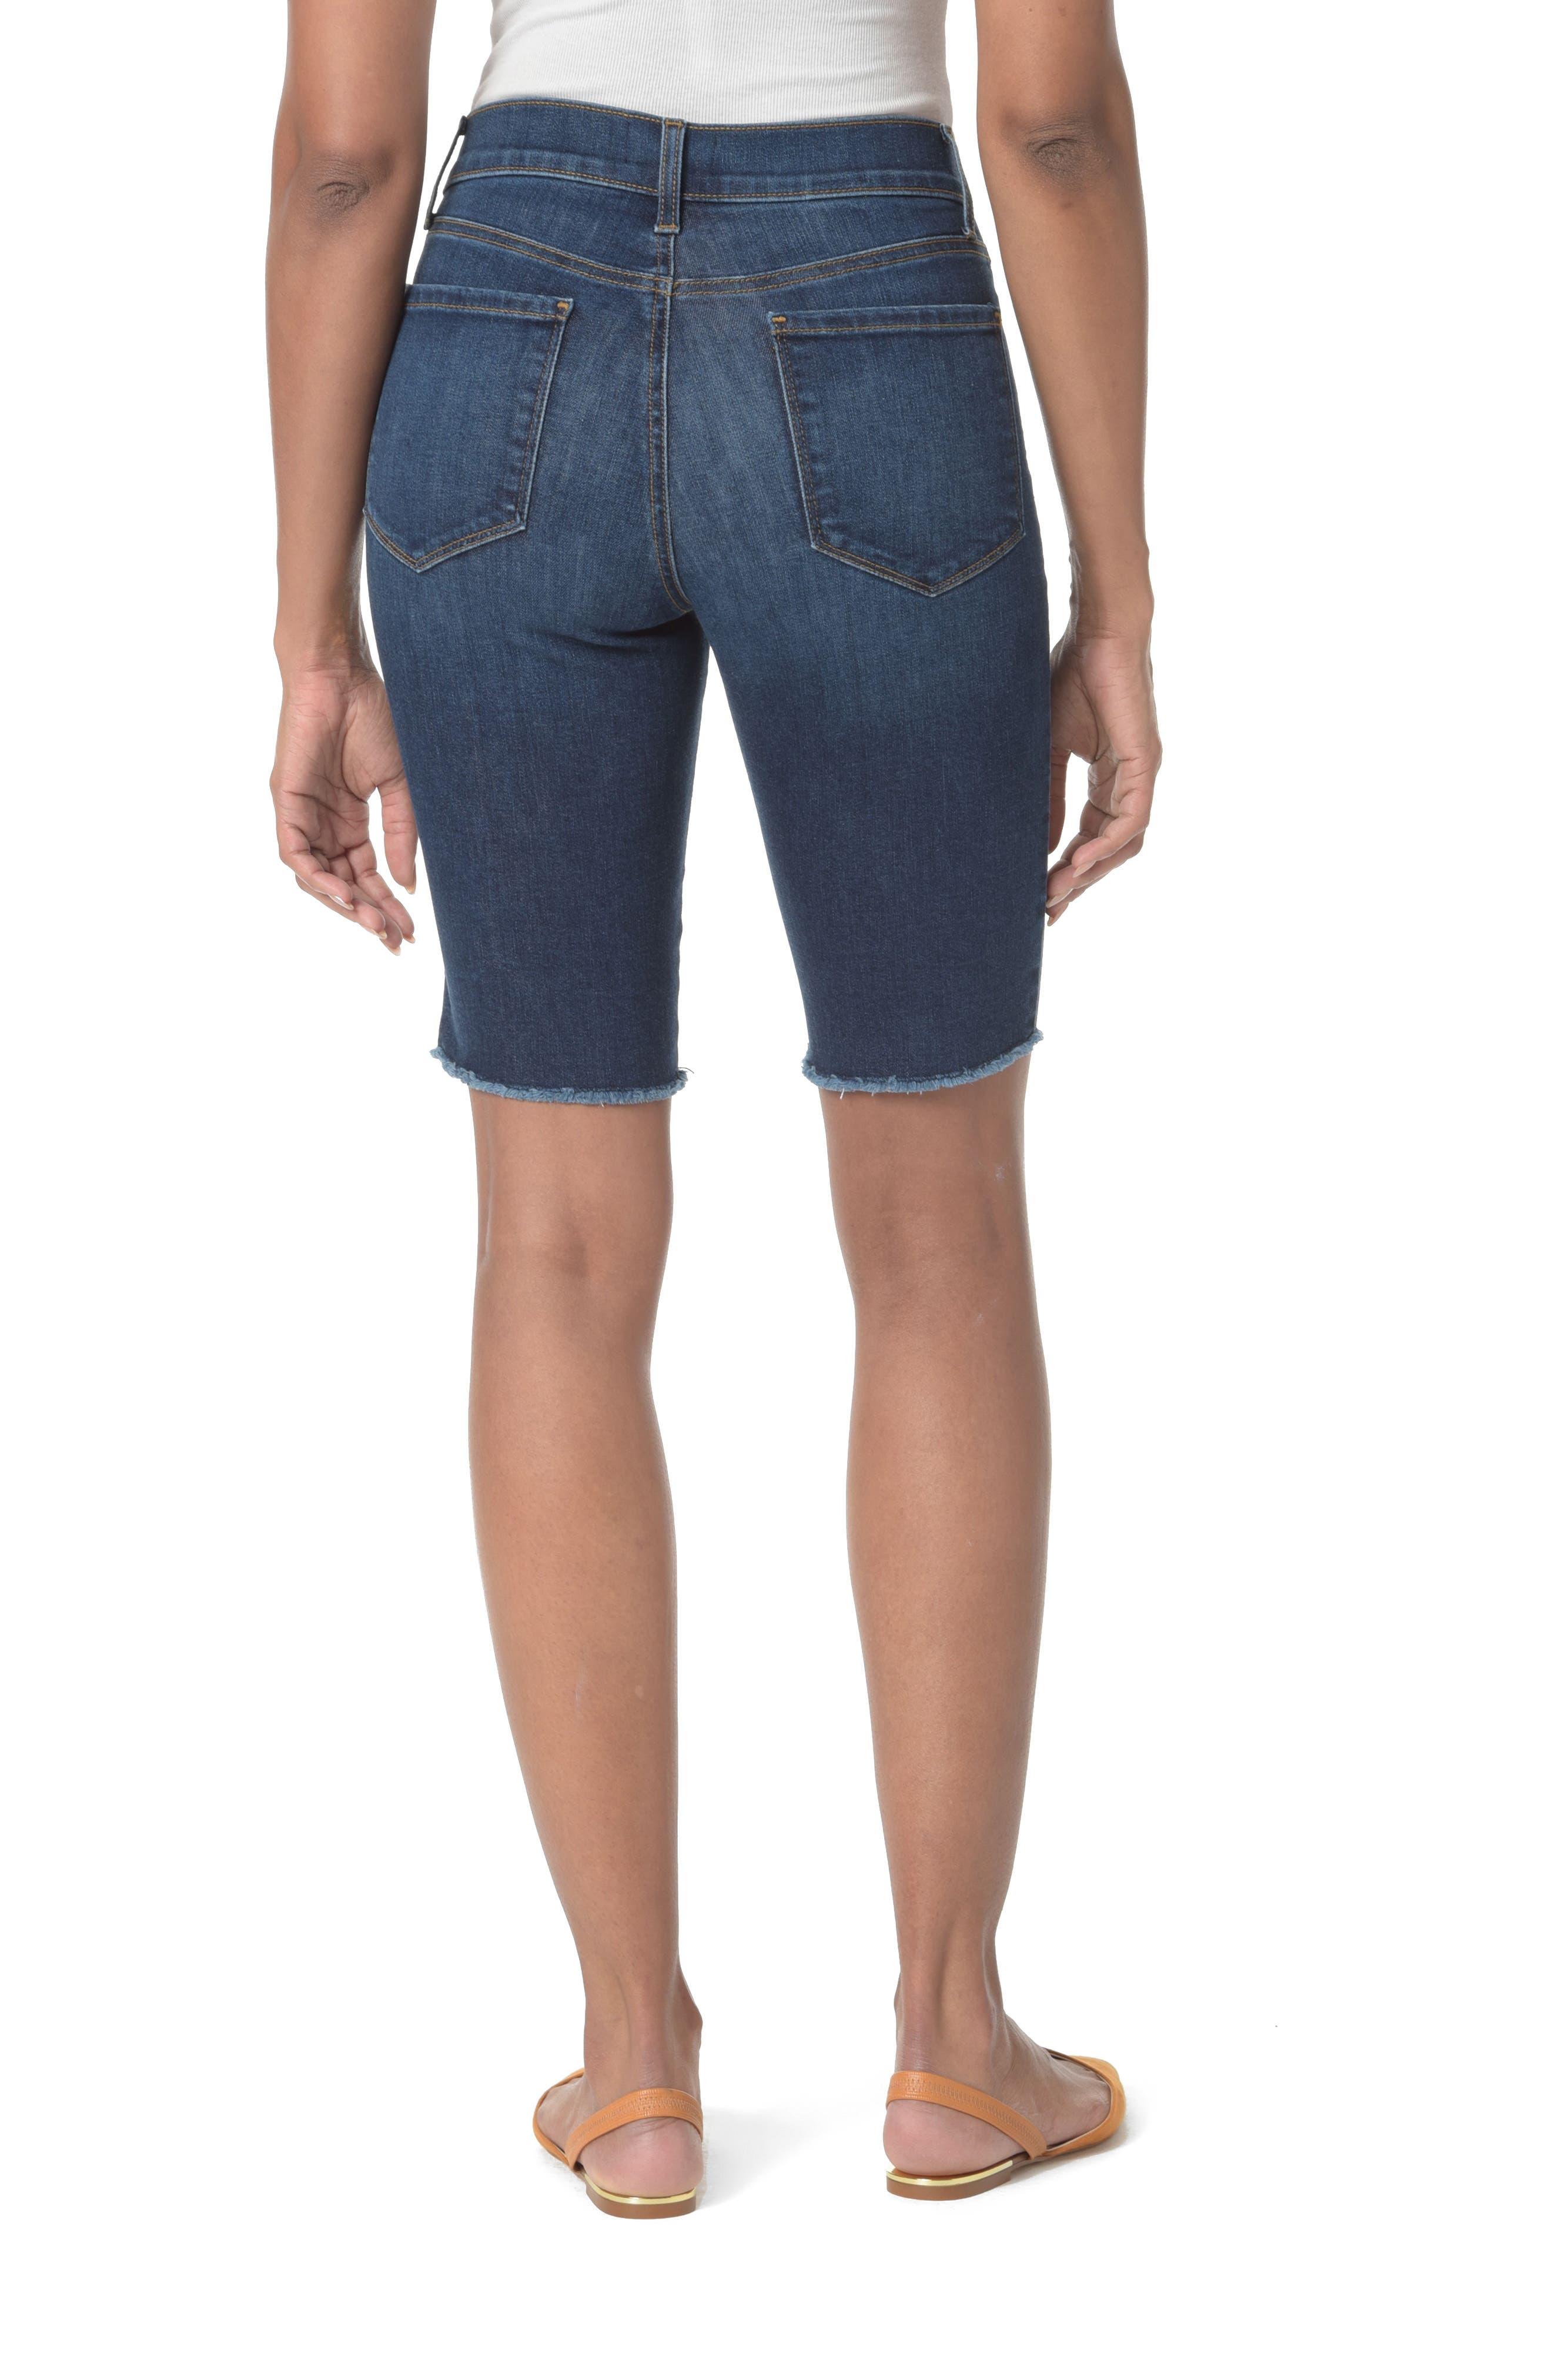 Briella Fray Hem Denim Bermuda Shorts,                             Alternate thumbnail 2, color,                             COOPER